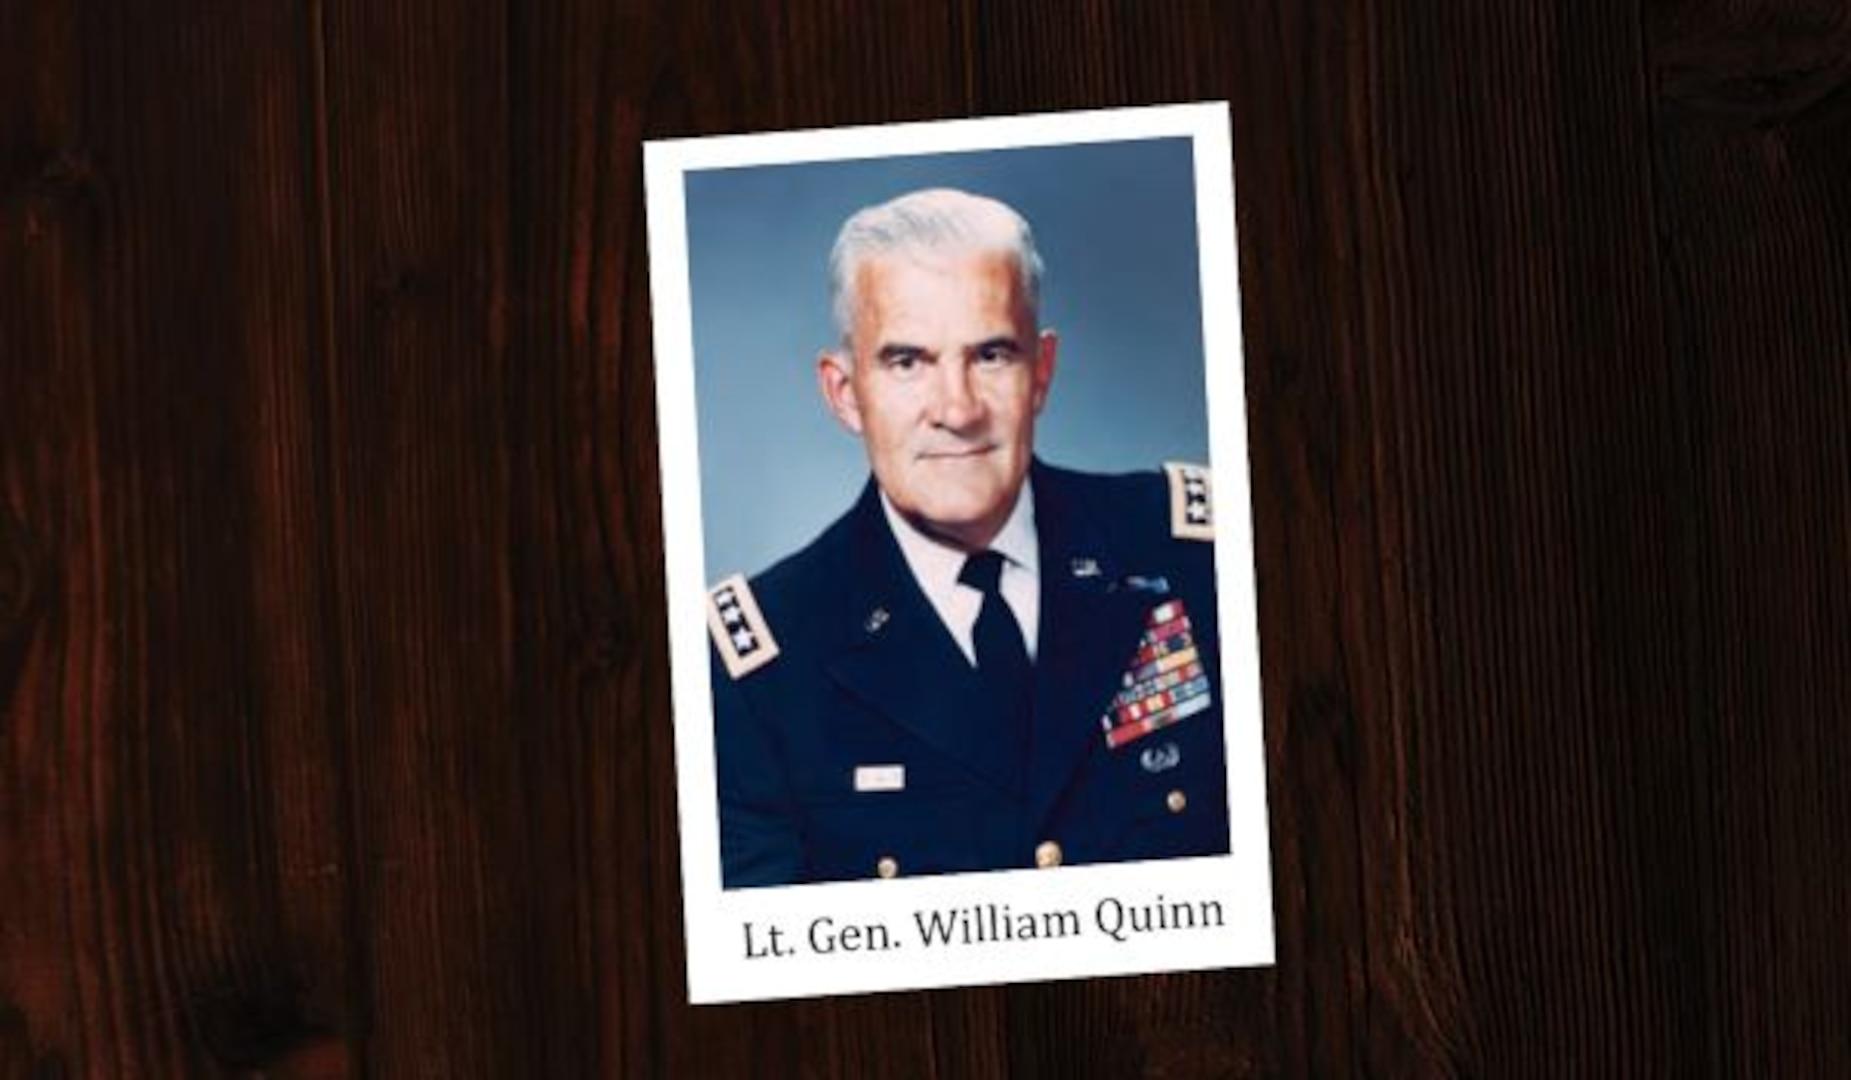 LTG William Quinn, DIA's first deputy director